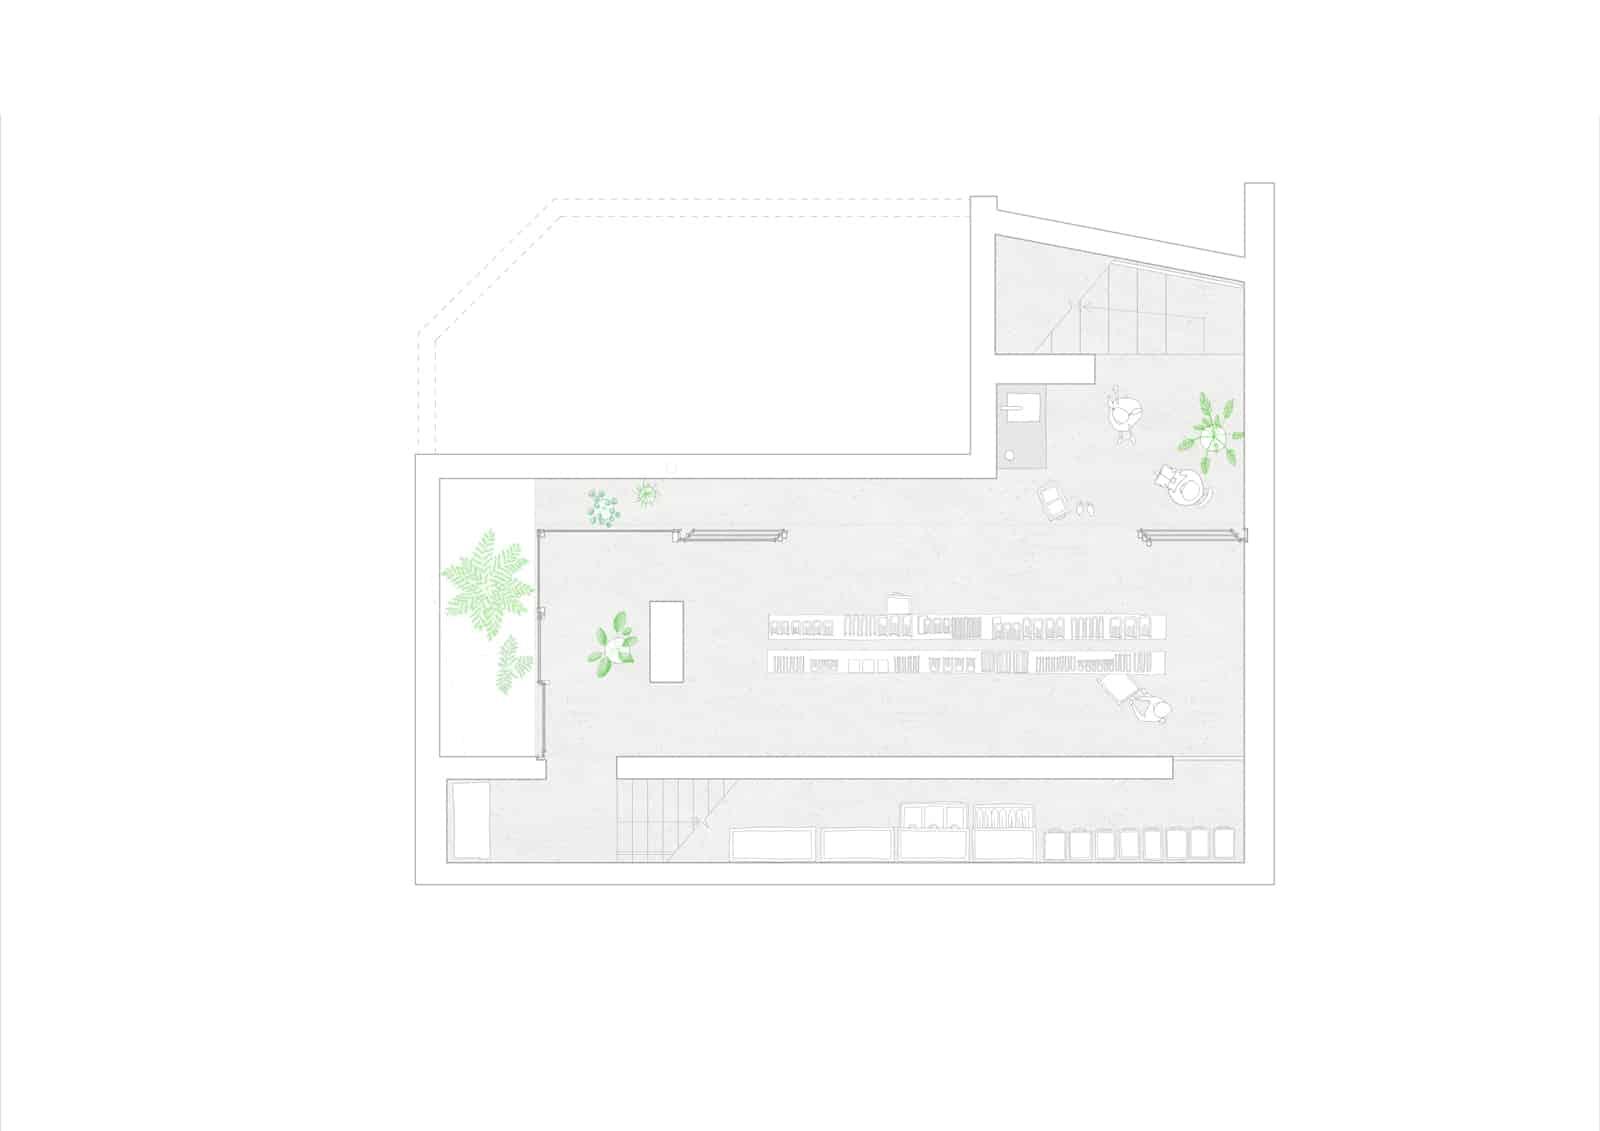 Weather House  - 20210827 NotArchitecsStudio WeatherHouse 11.4 62